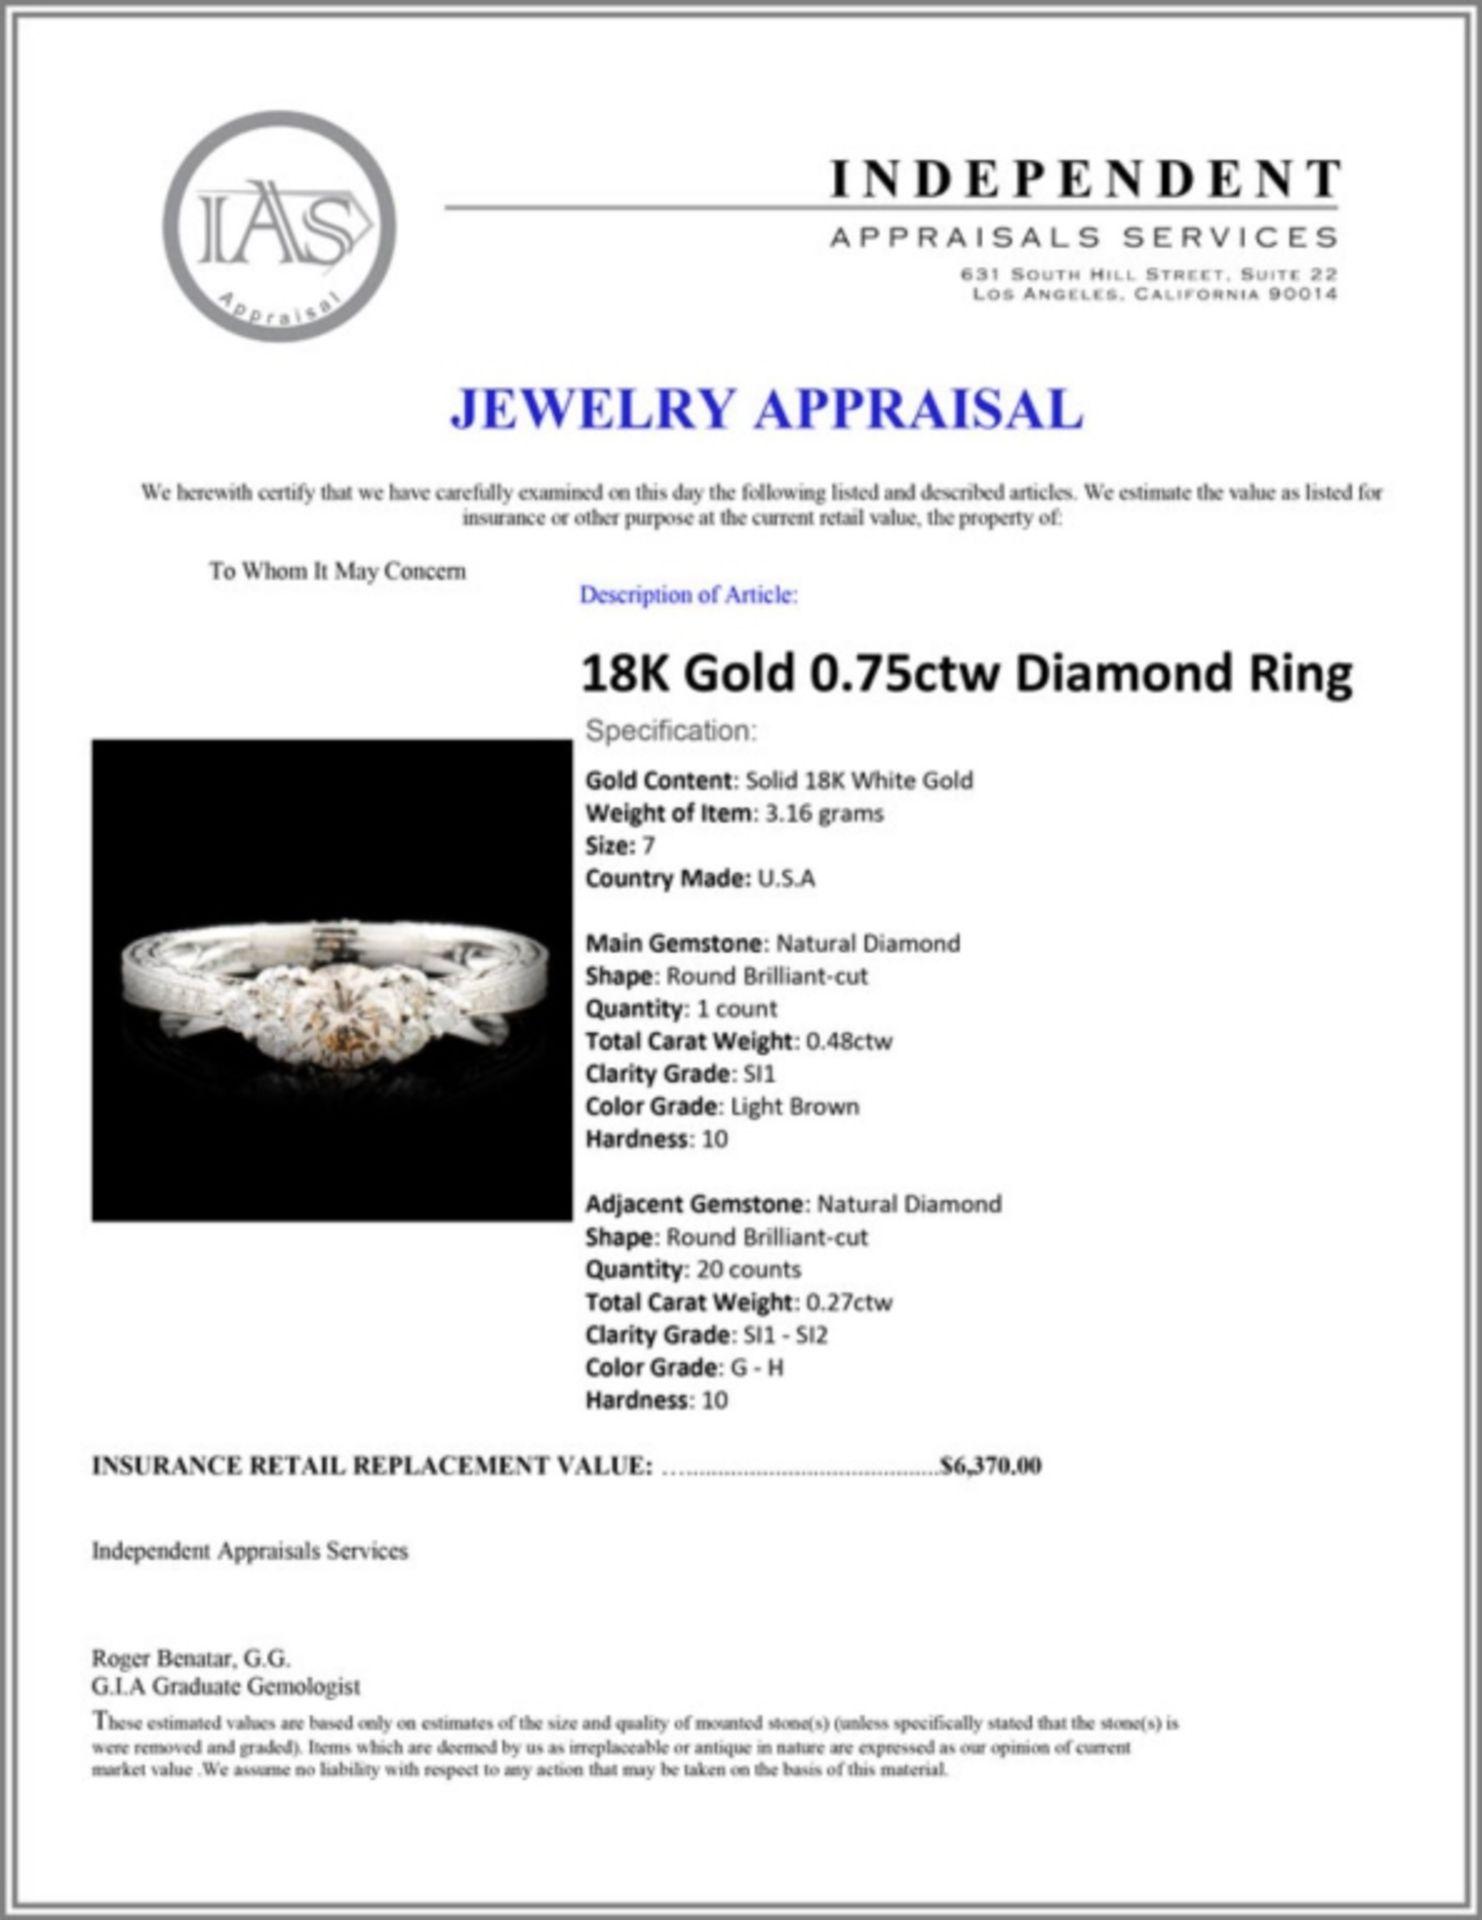 18K Gold 0.75ctw Diamond Ring - Image 5 of 5